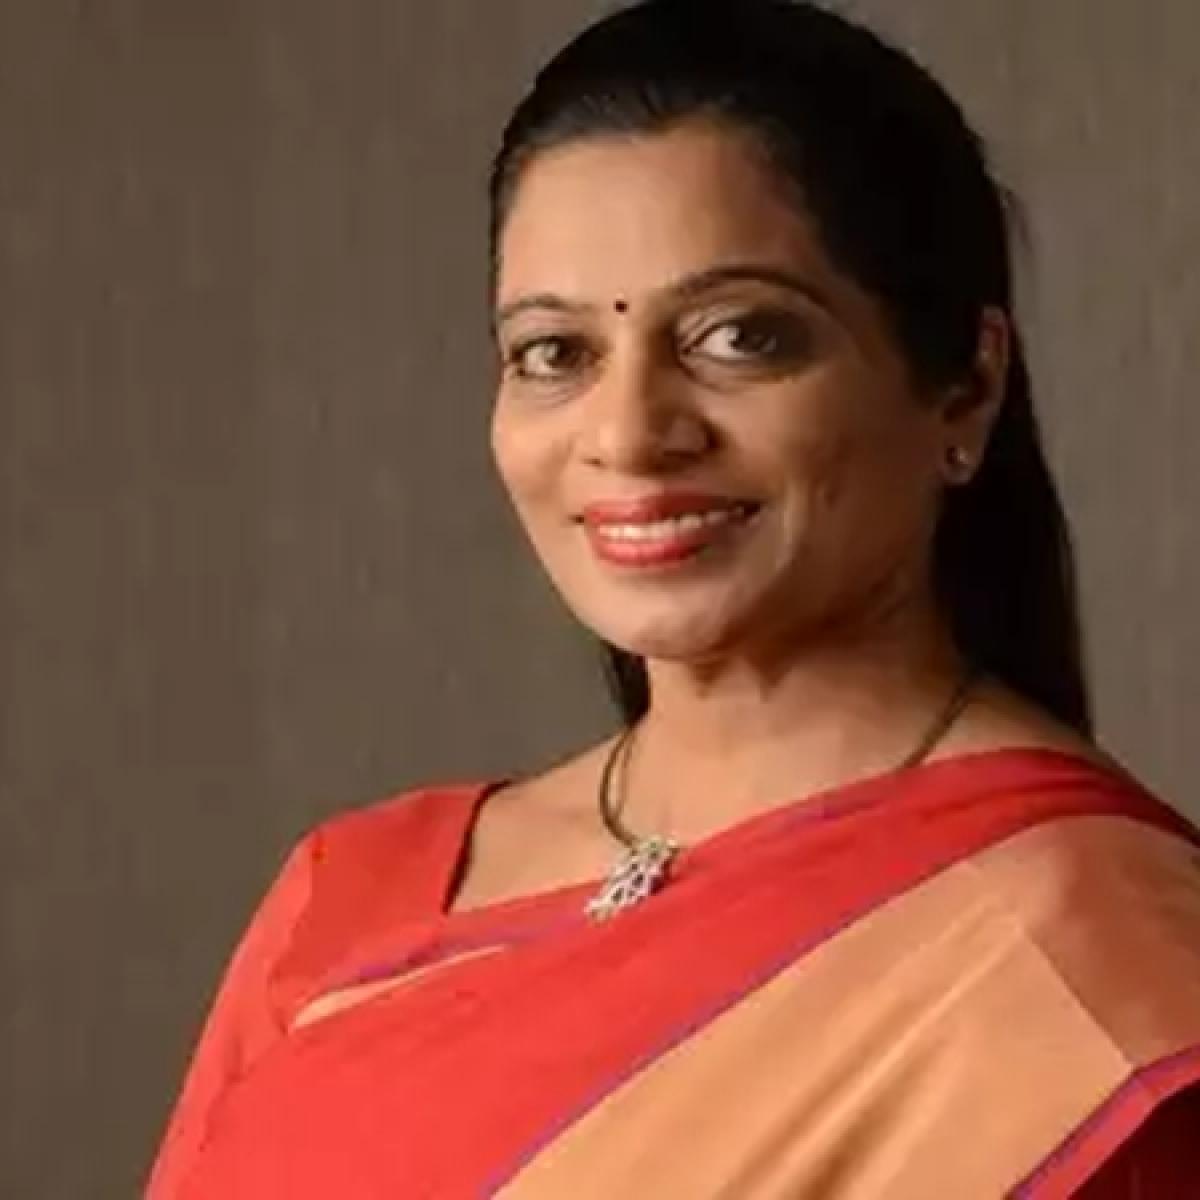 Maharashtra Election 2019 - Mira Bhayandar Assembly Constituency of Mumbai: Independent candidate Geeta Bharat Jain wins